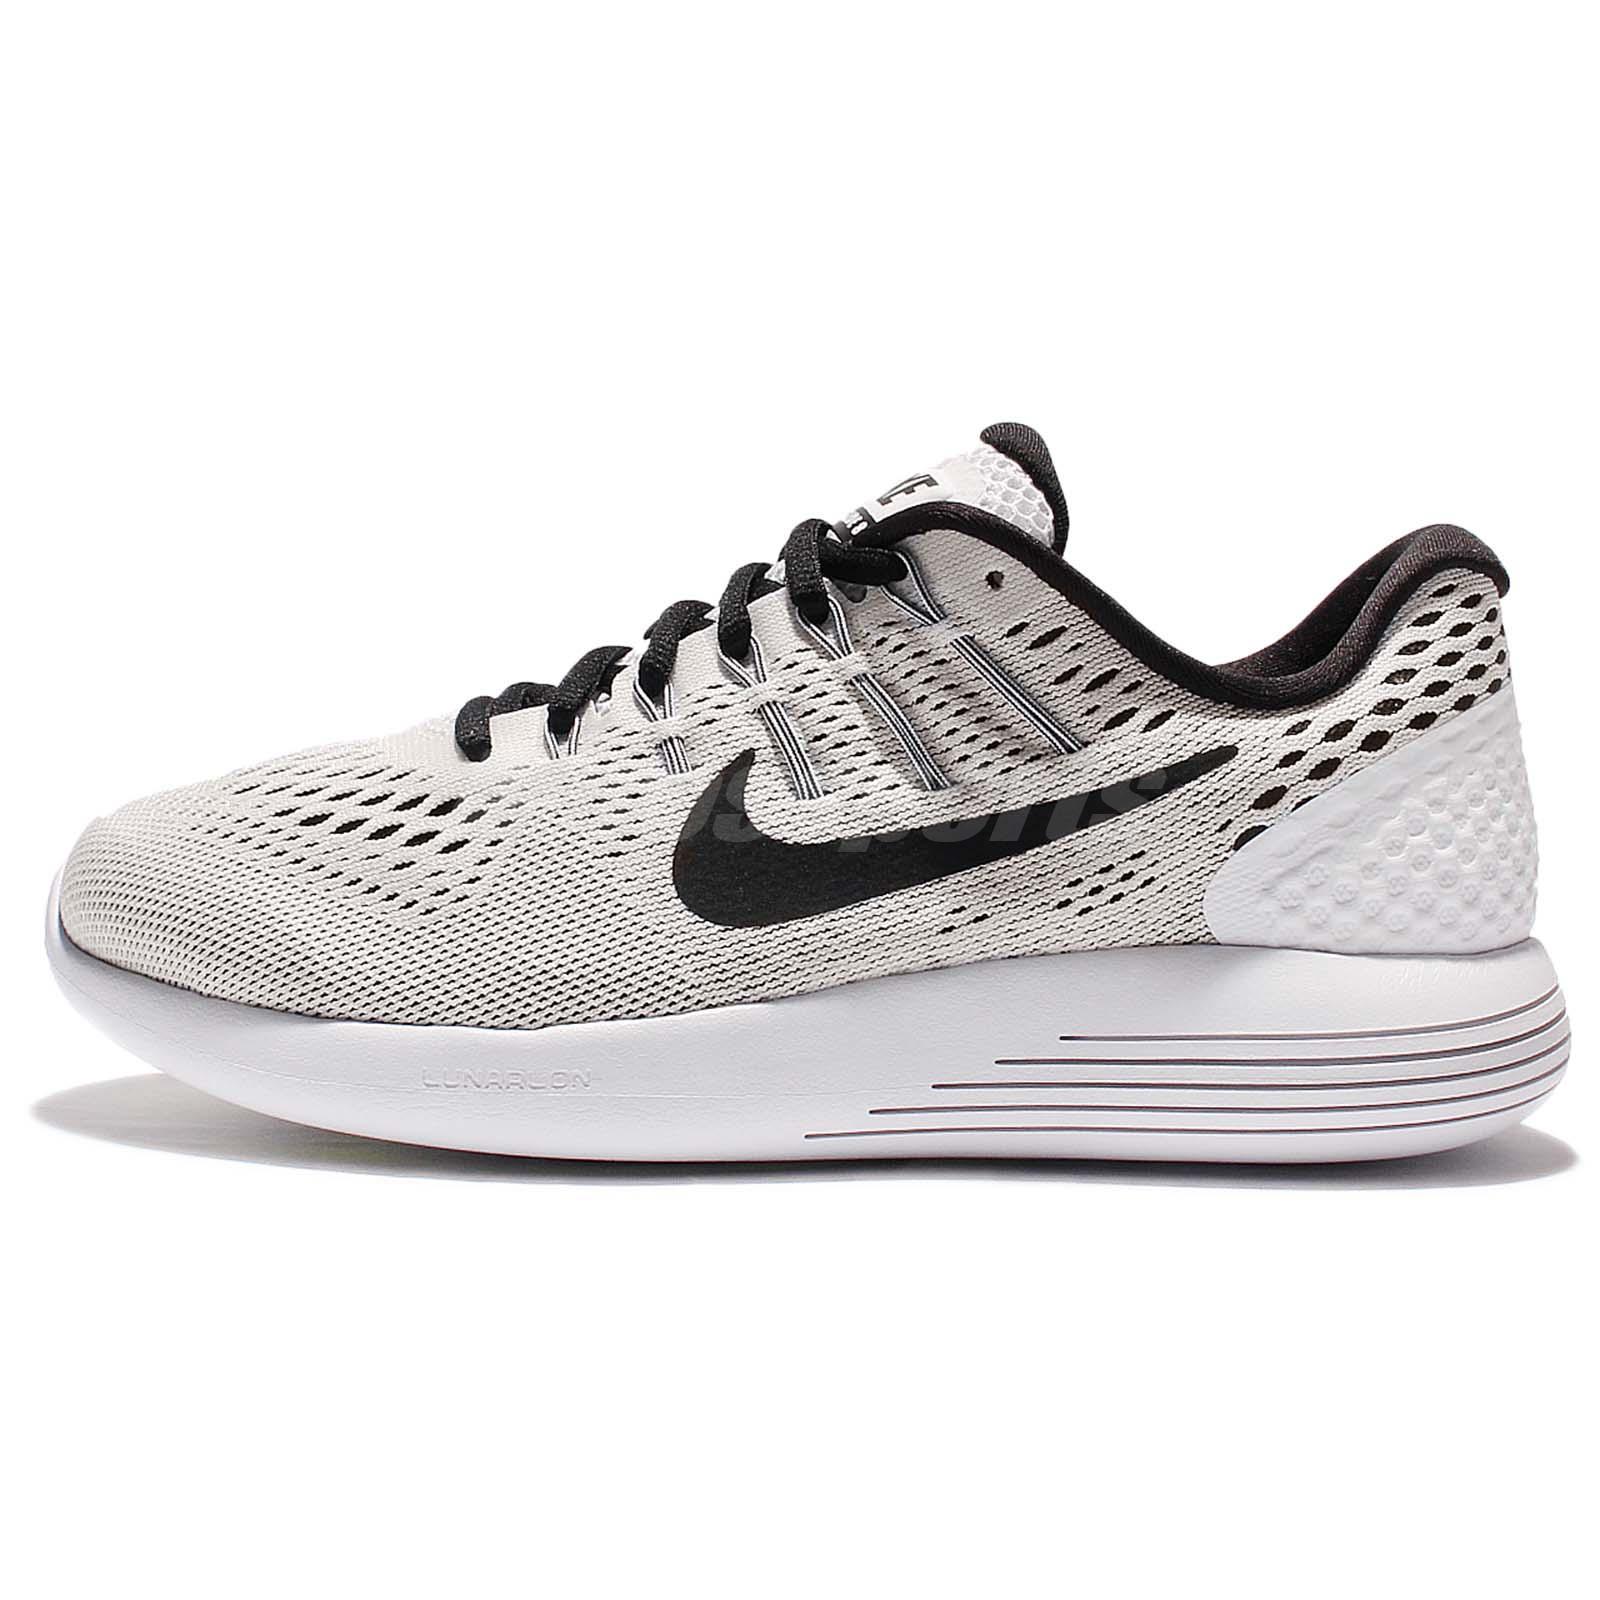 271a279b2c93 Nike Wmns Lunarglide 8 VIII White Black Women Running Shoes Sneakers 843726- 101